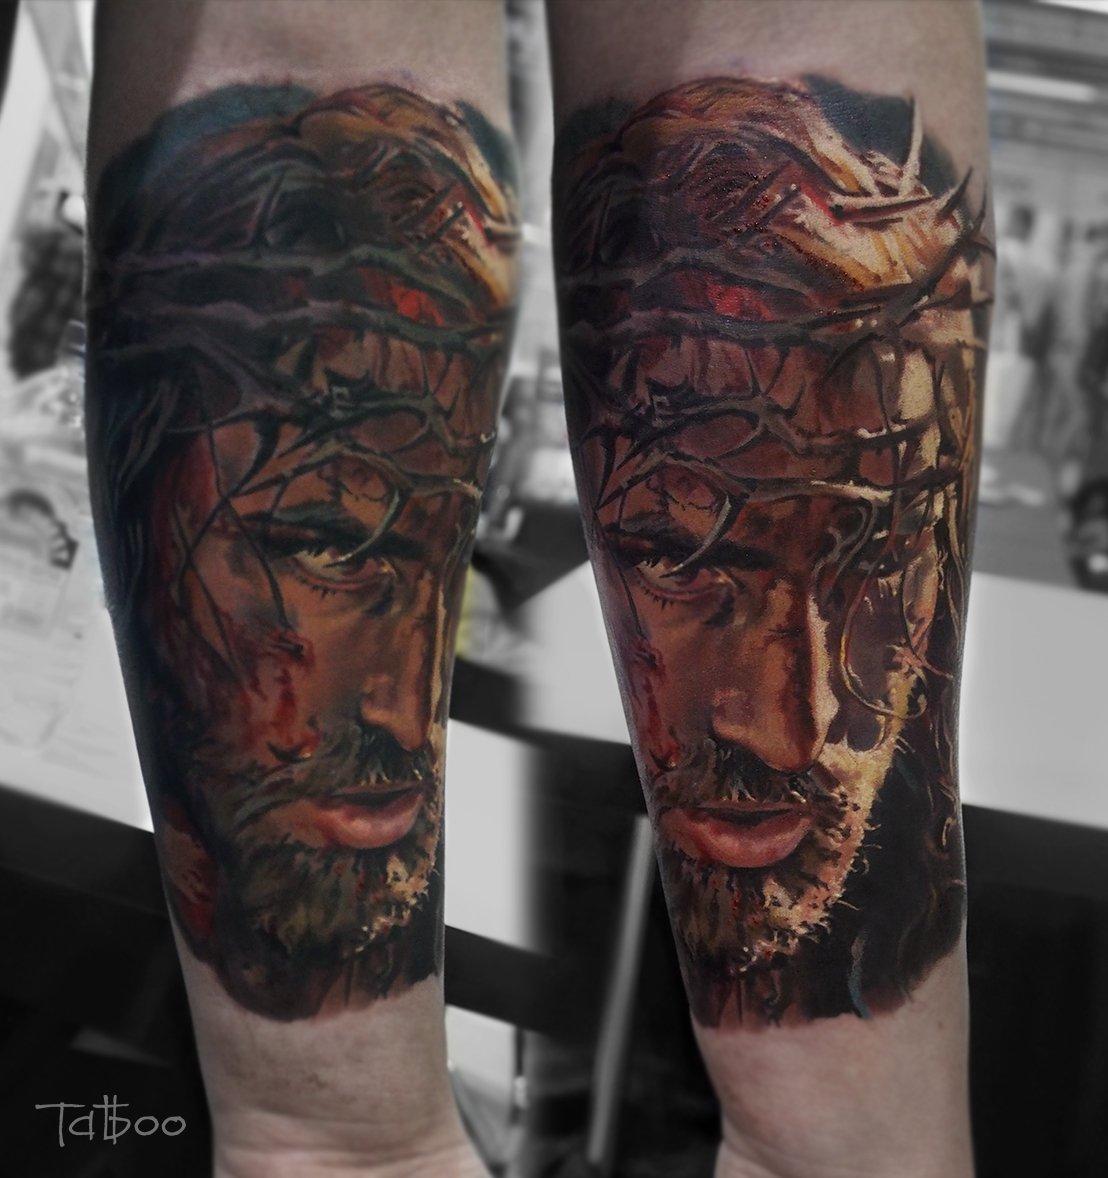 CiBJtHbXEAAVK7A - Tatuagens realistas da russa Valentina Ryabova